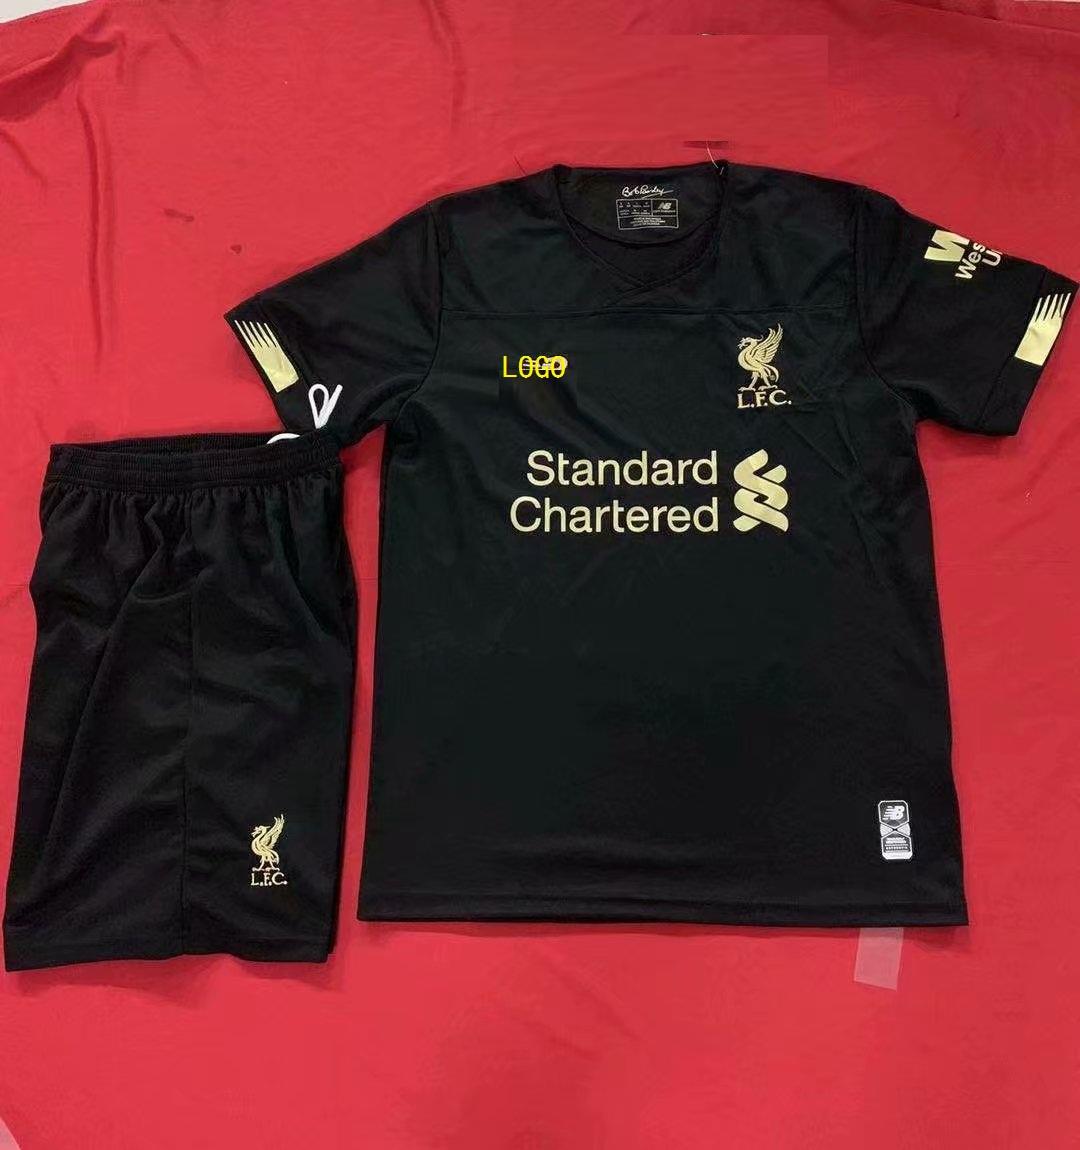 outlet store 688ba 22218 2019/20 Cheap Adult Liverpool Goalkeeper Soccer Jersey Uniform Football  Complete Sets GK